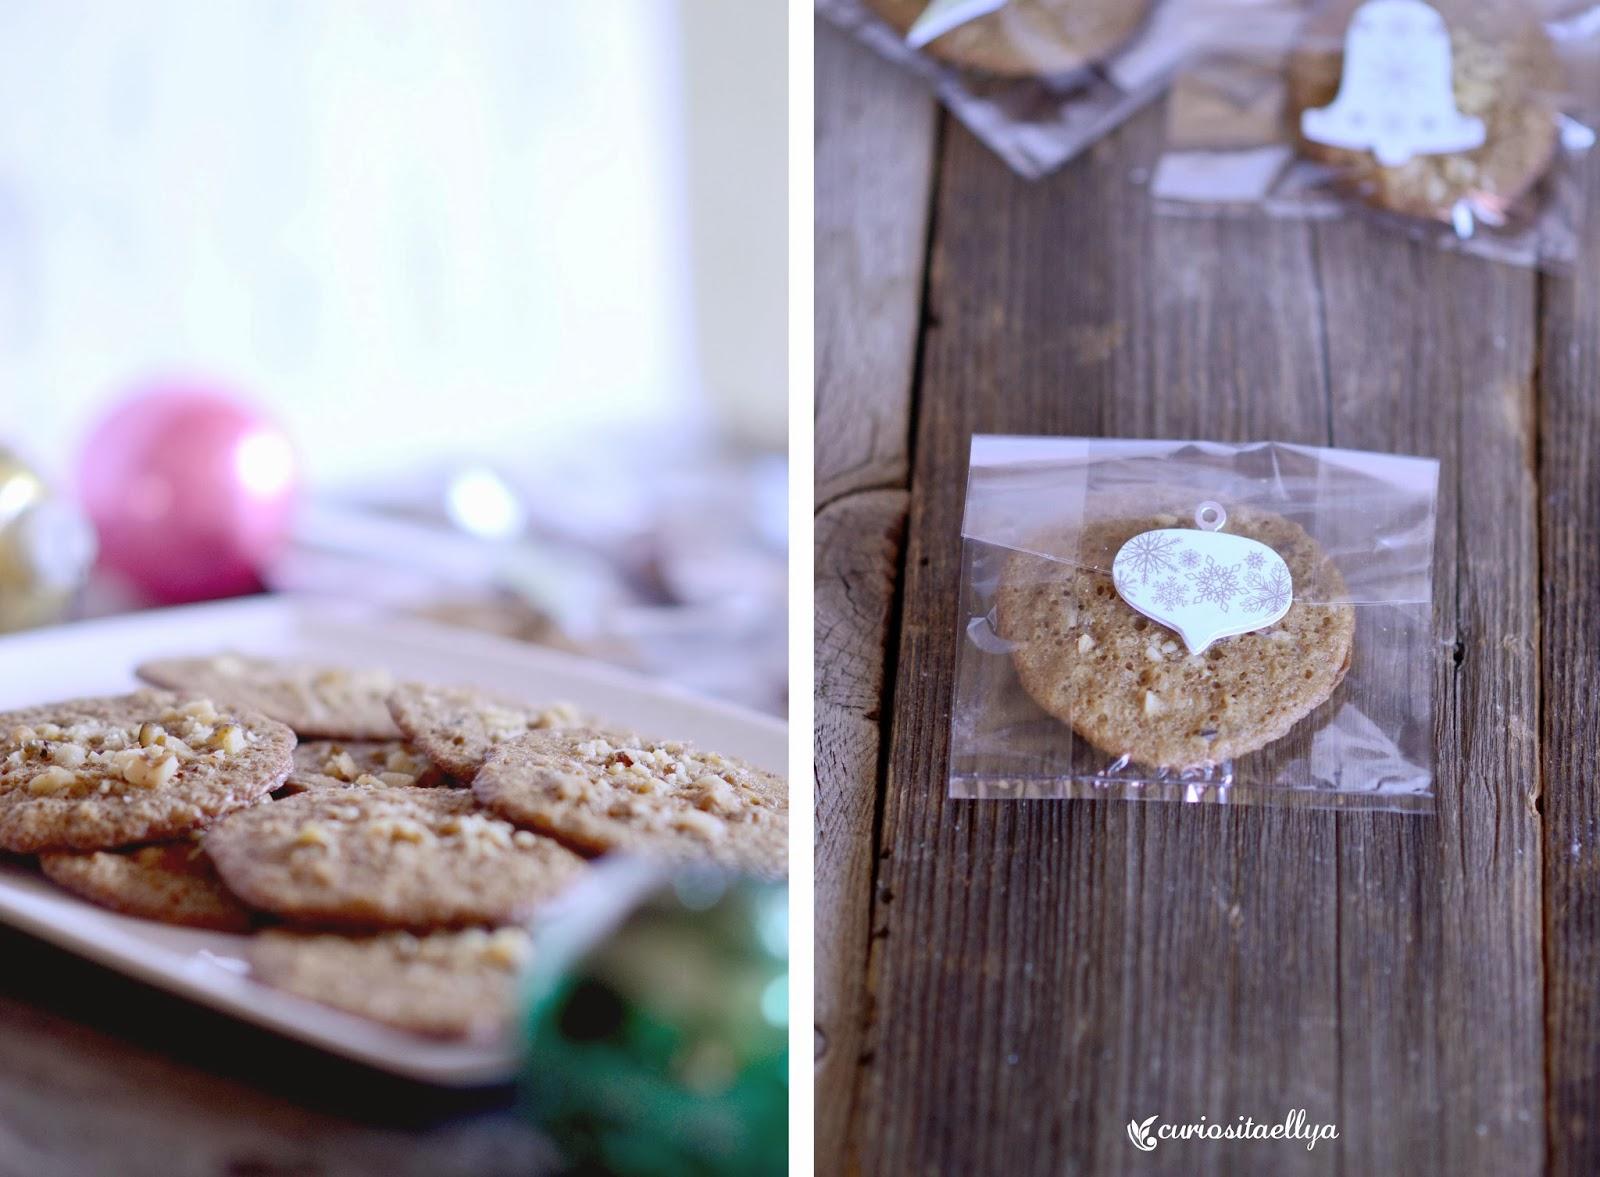 Curiositaellya: Walnut Rum Wafers Cookies